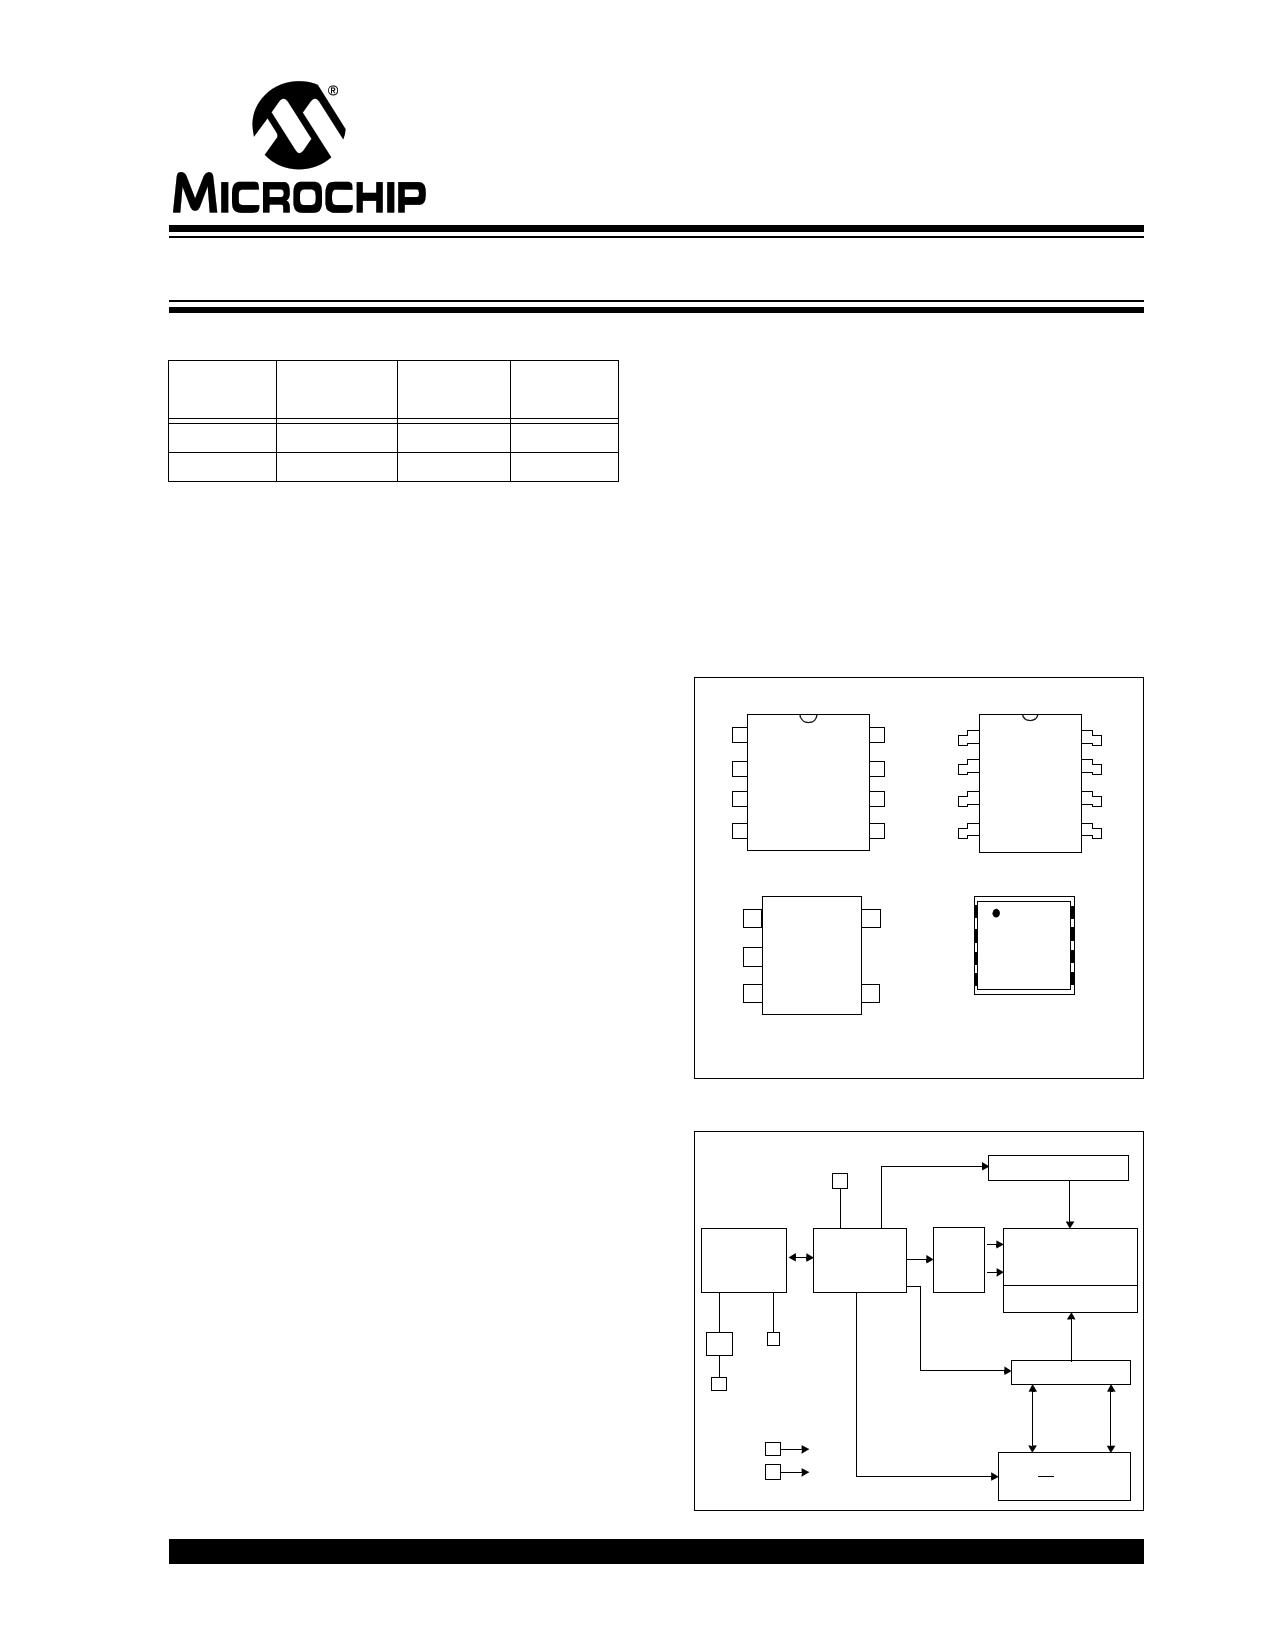 24AA01 datasheet, circuit